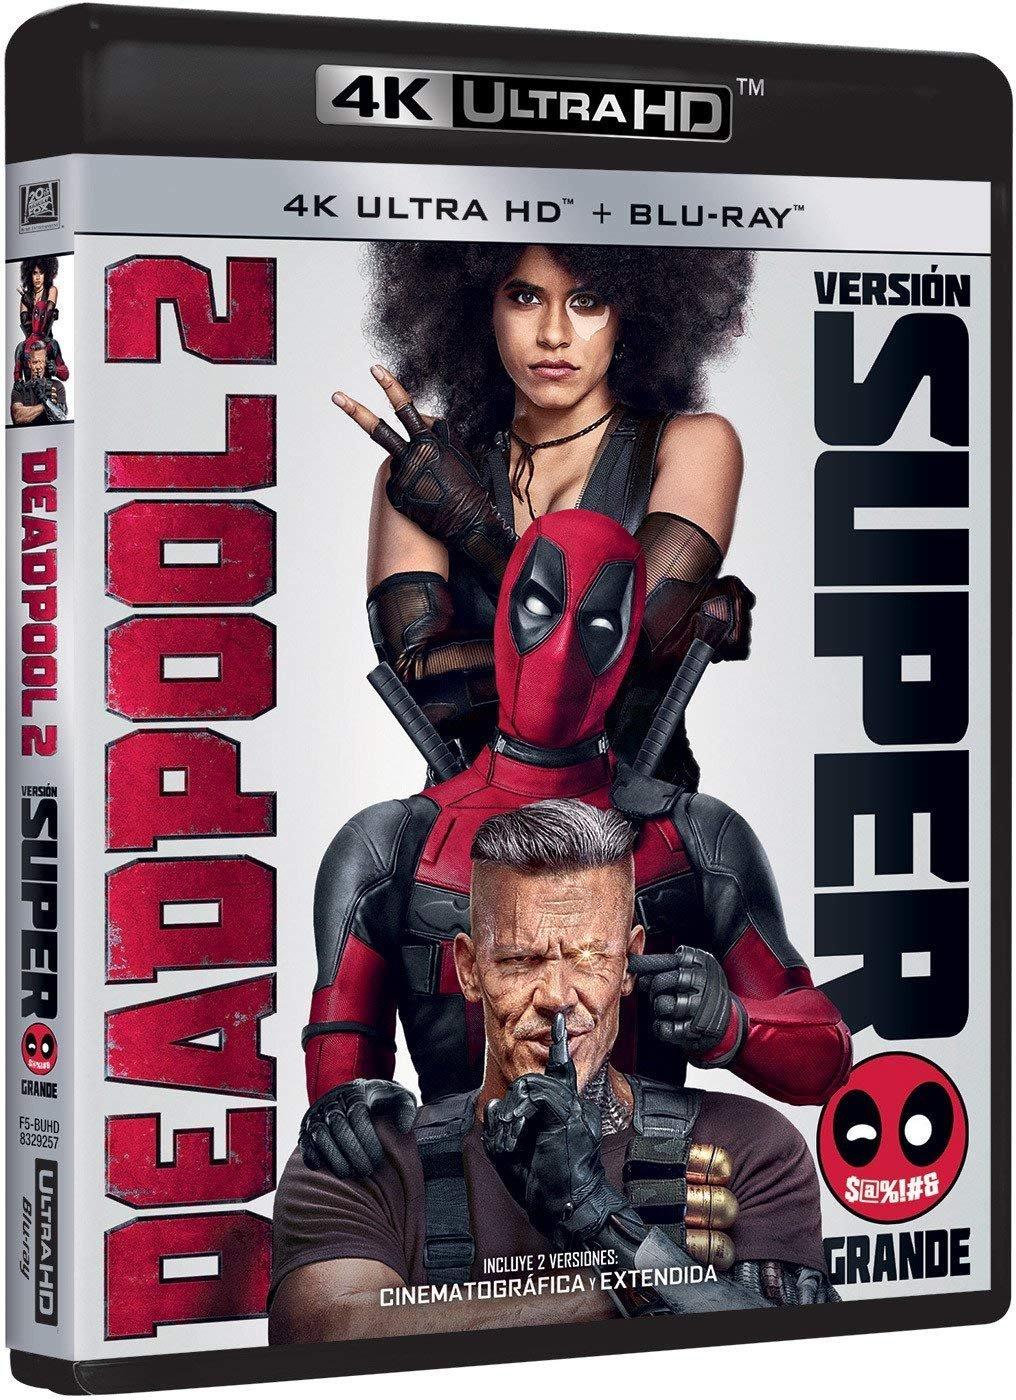 Deadpool 2 Versión Super $@%!# Grande 4k Uhd Blu-ray: Amazon.es: Ryan Reynolds, Josh Brolin, Morena Baccarin, Eddie Marsan, David Leitch, Ryan Reynolds, Josh Brolin: Cine y Series TV